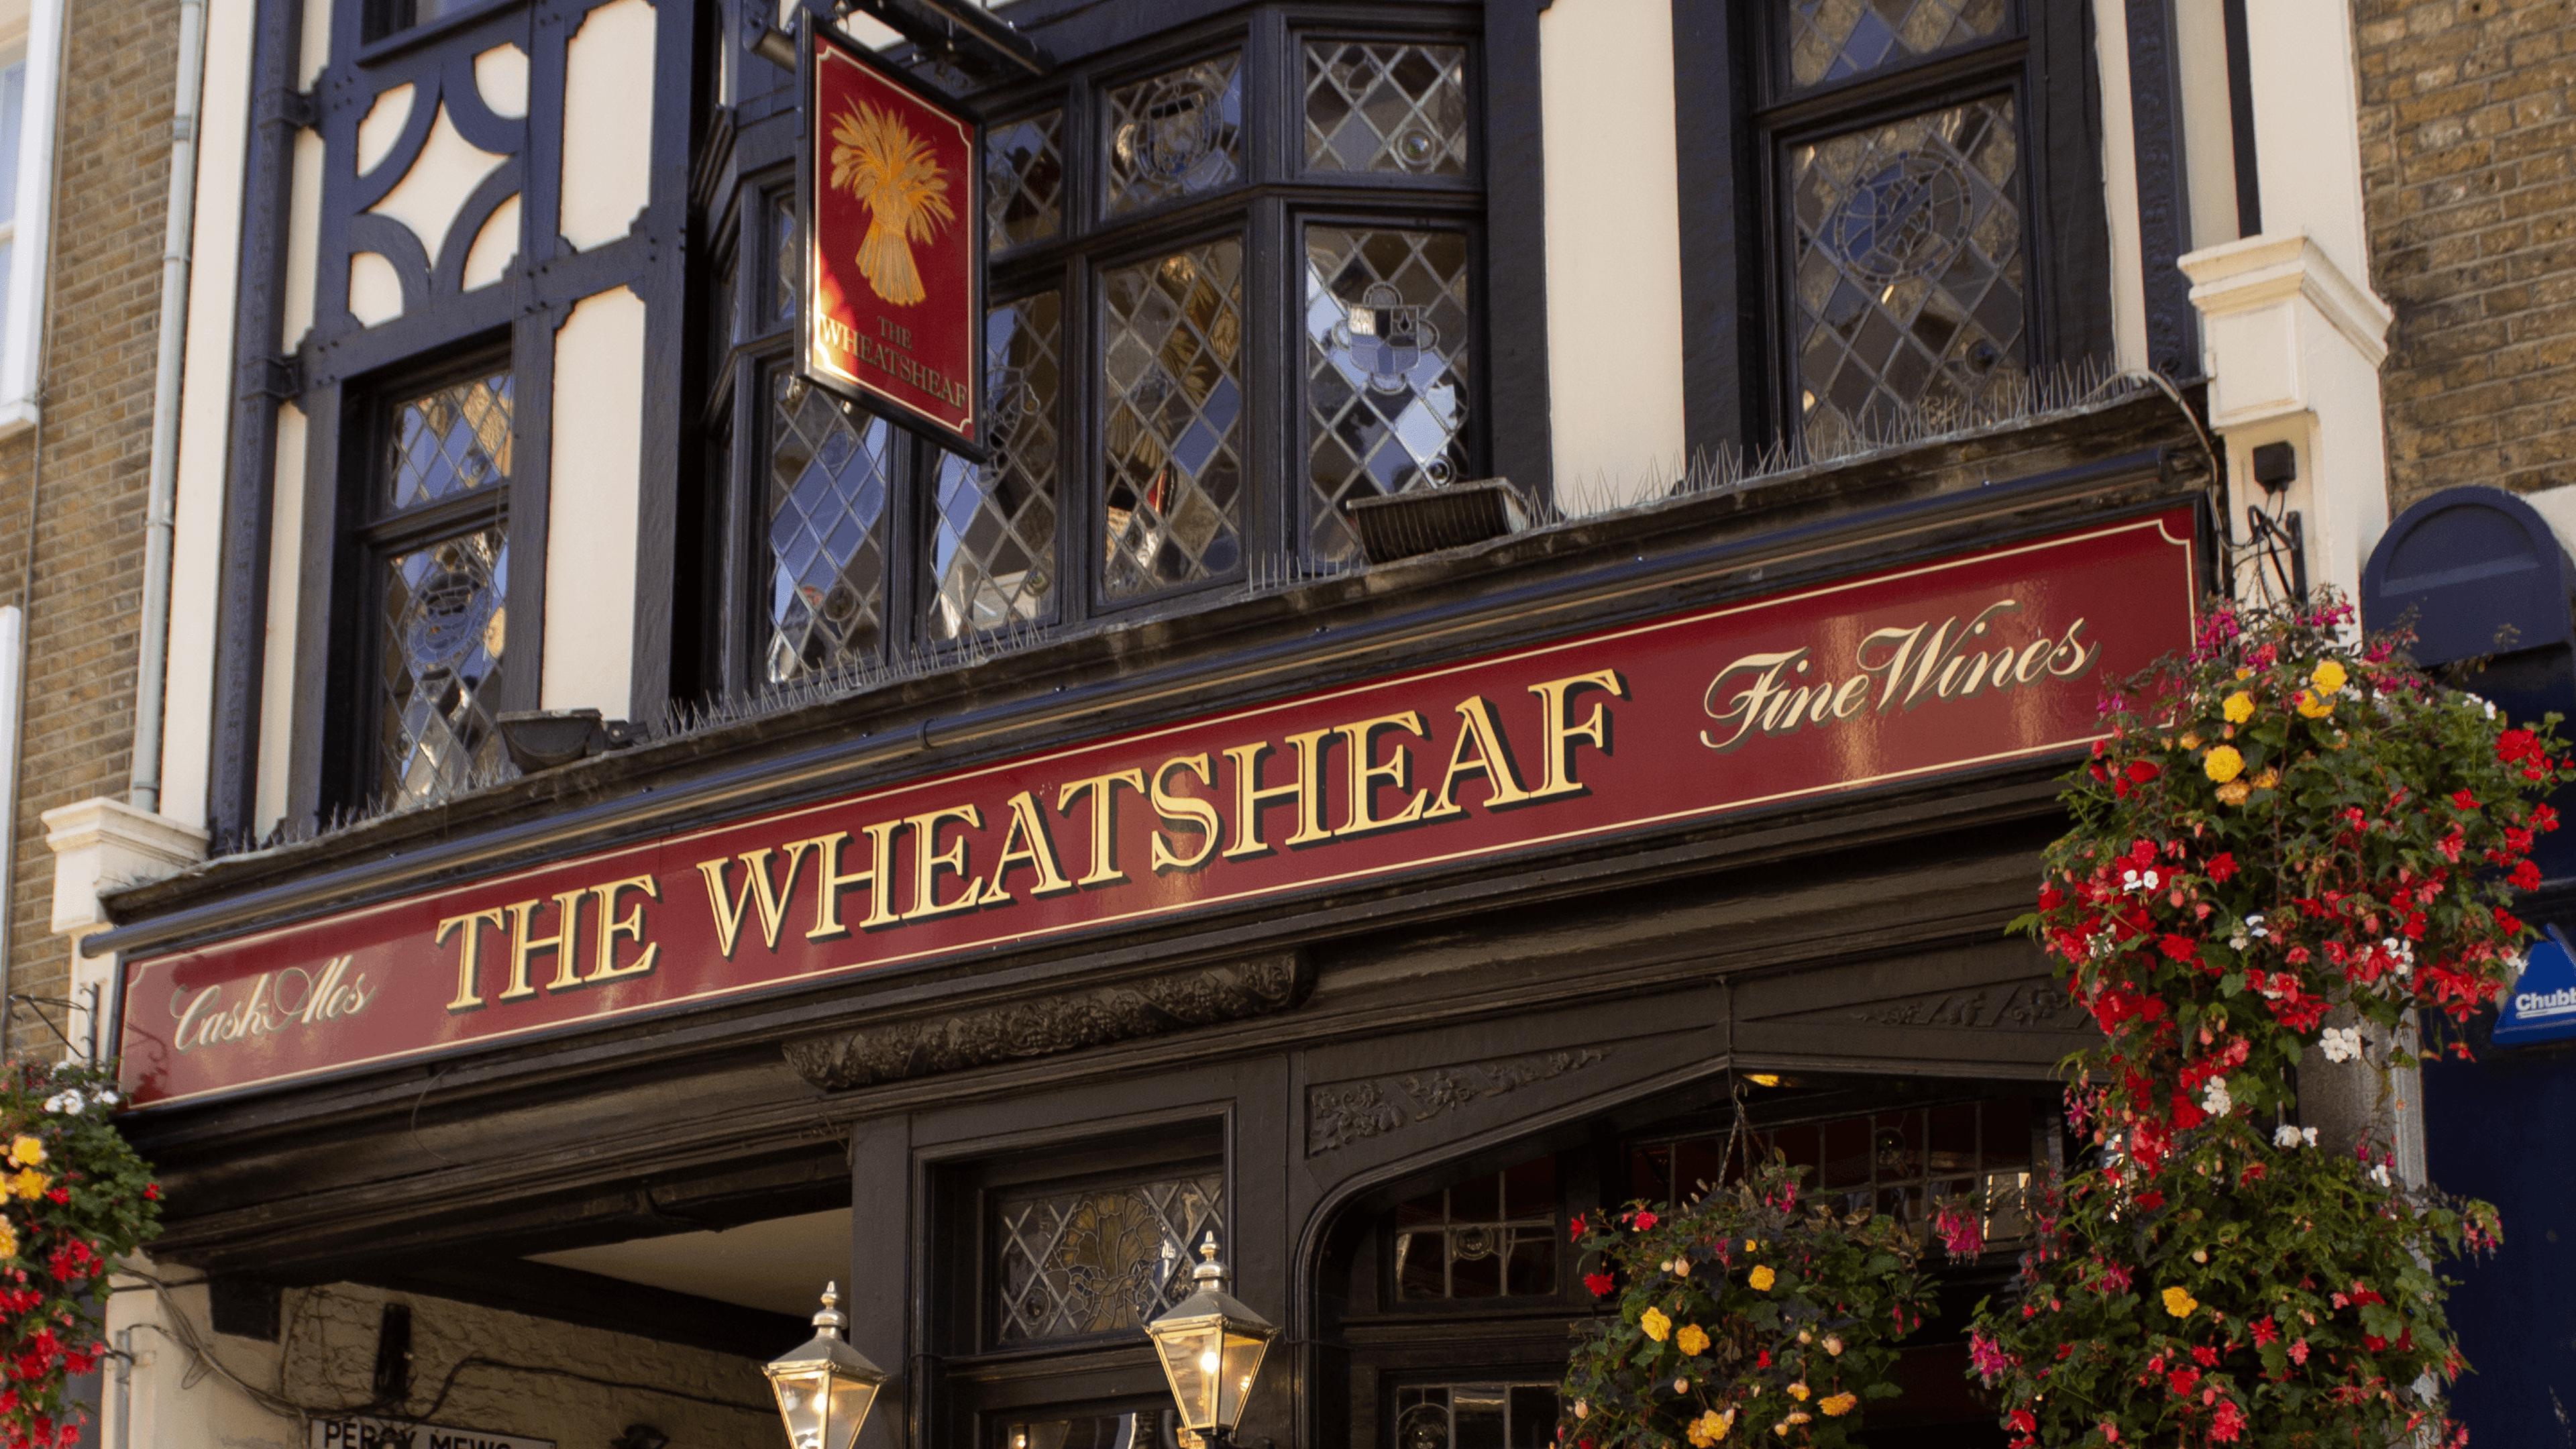 Wheatsheaf-home-image-D1.png